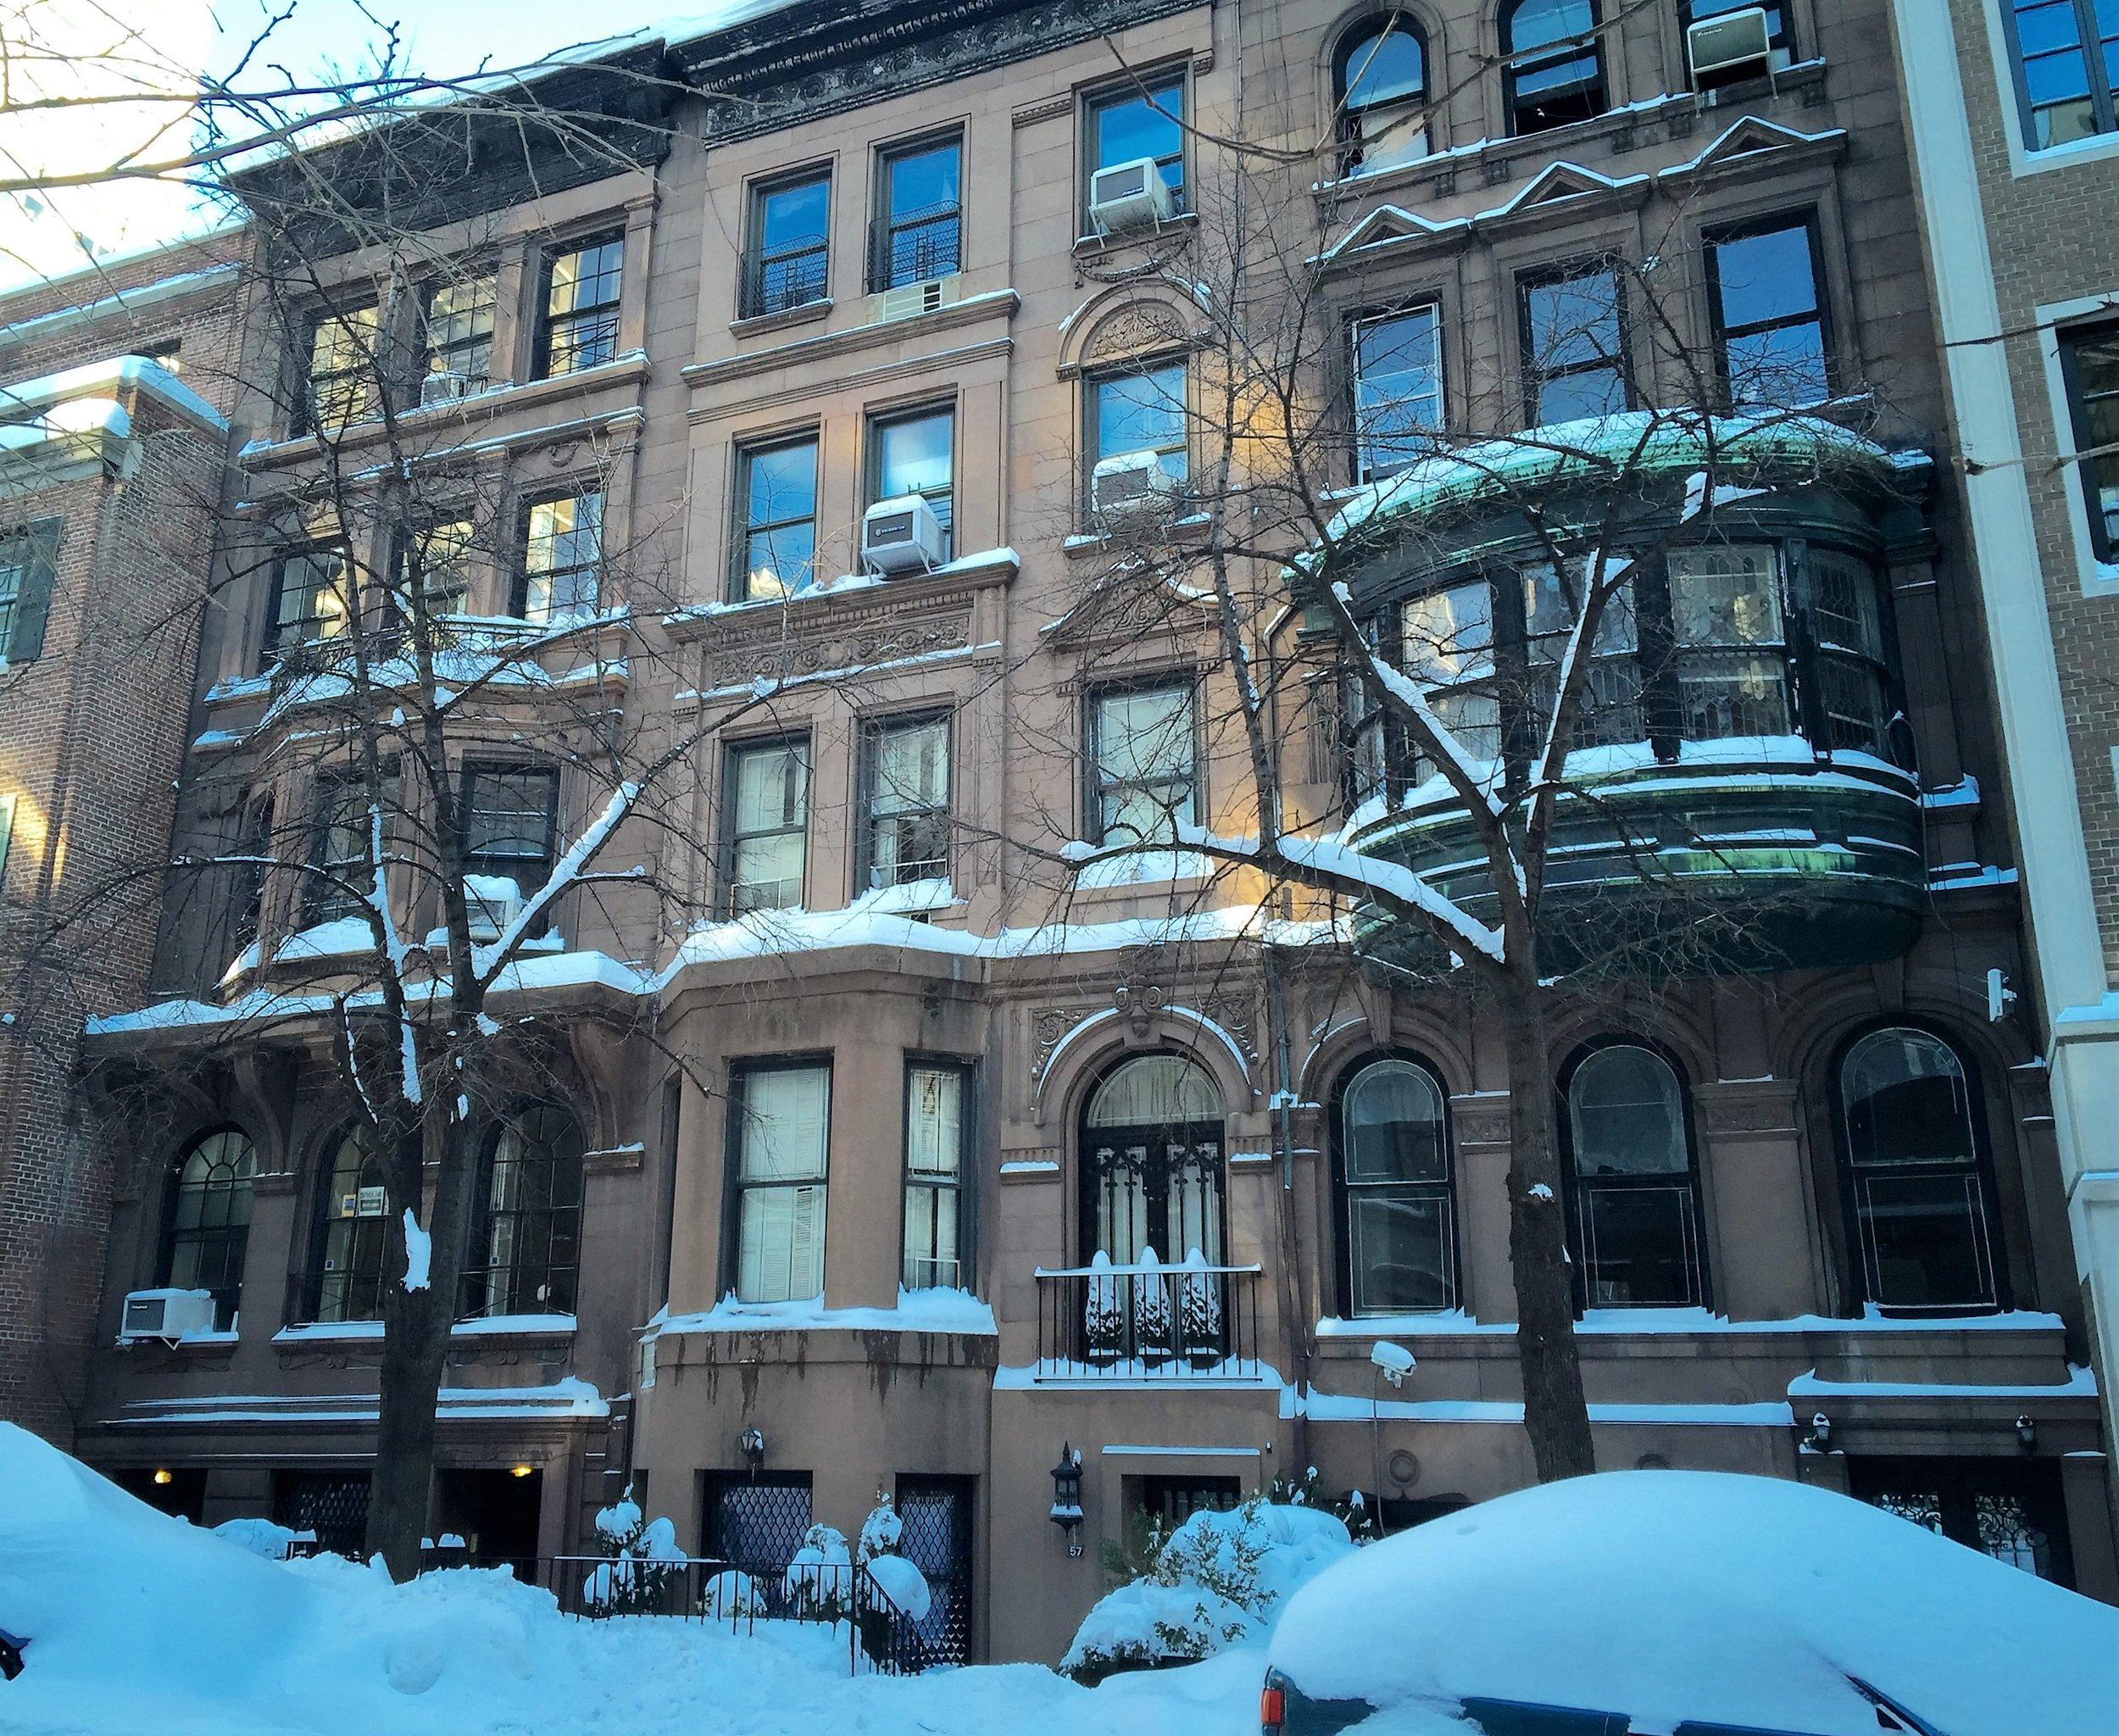 01-26-16 Eightieth Street.jpg